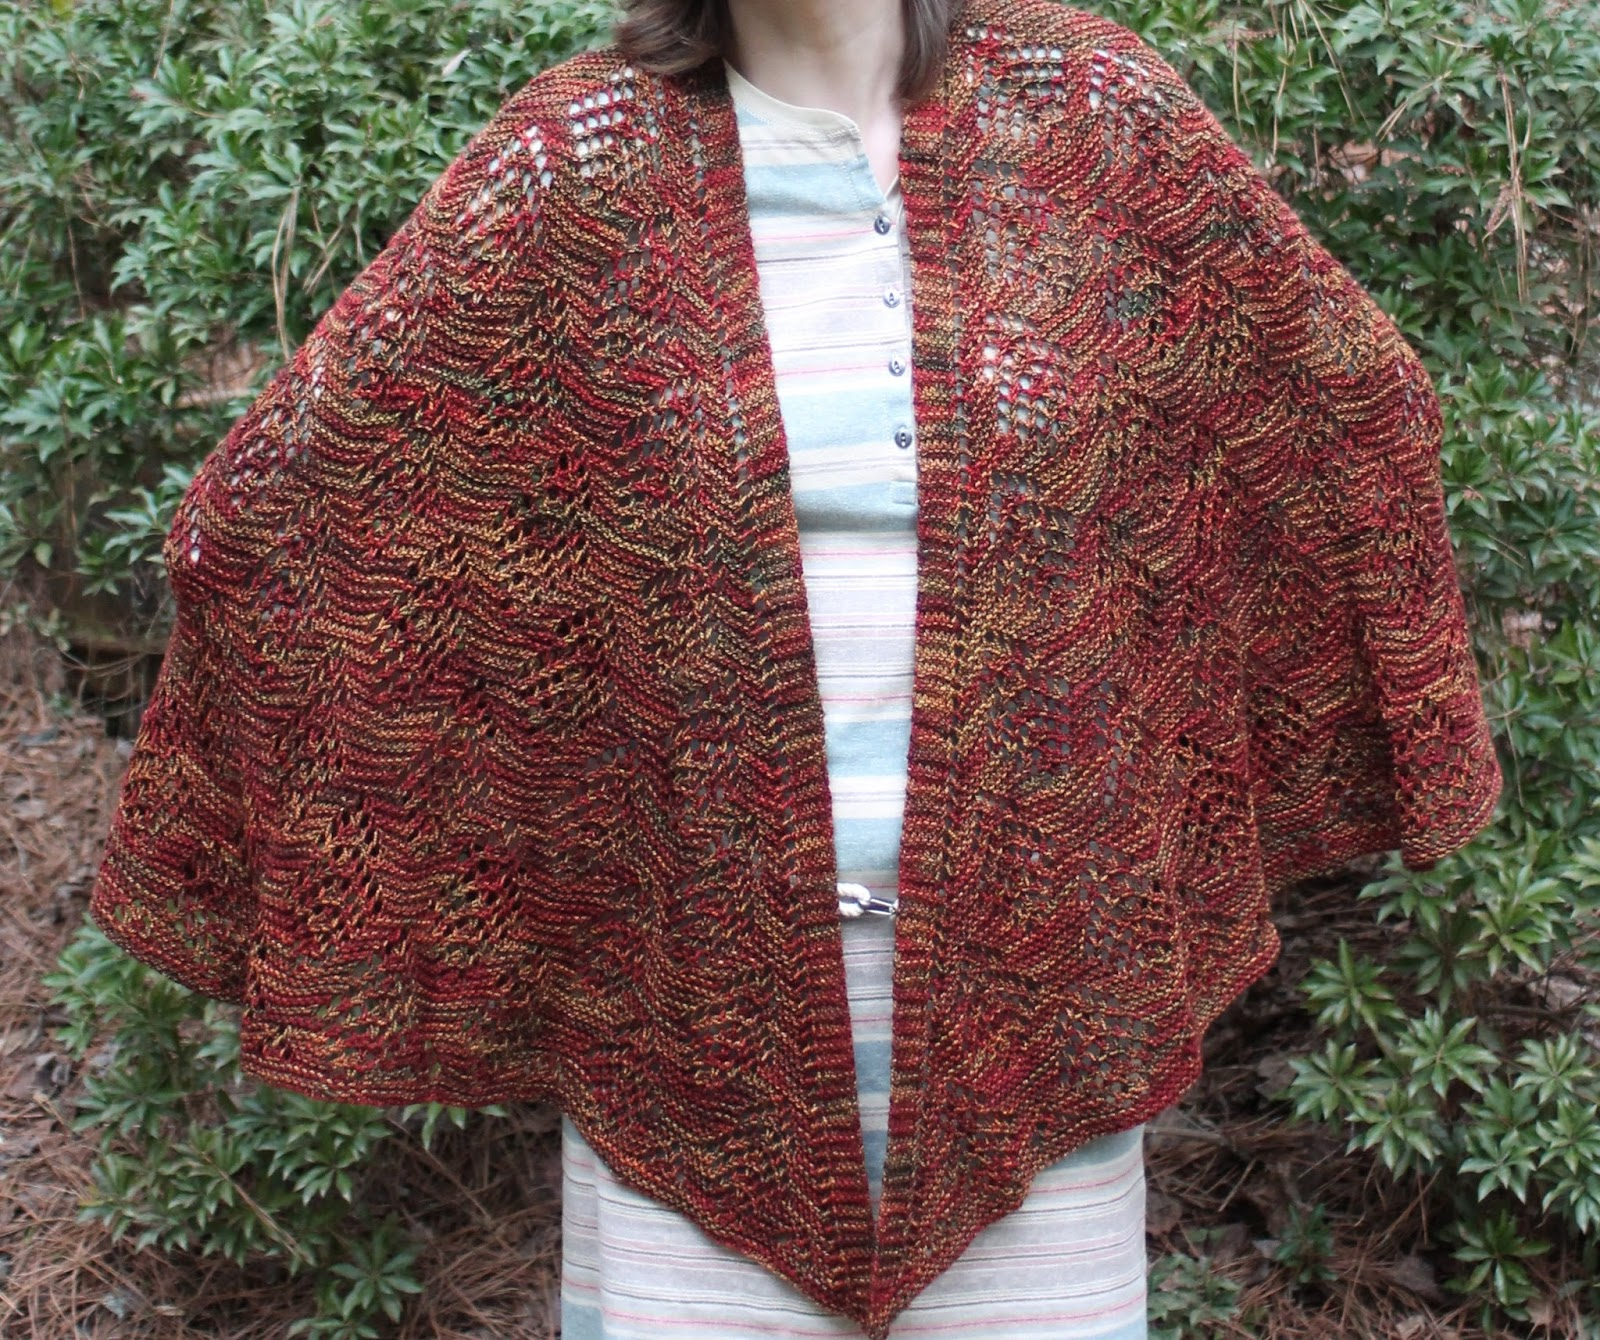 Stitching \'n\' Knitting: February 2016